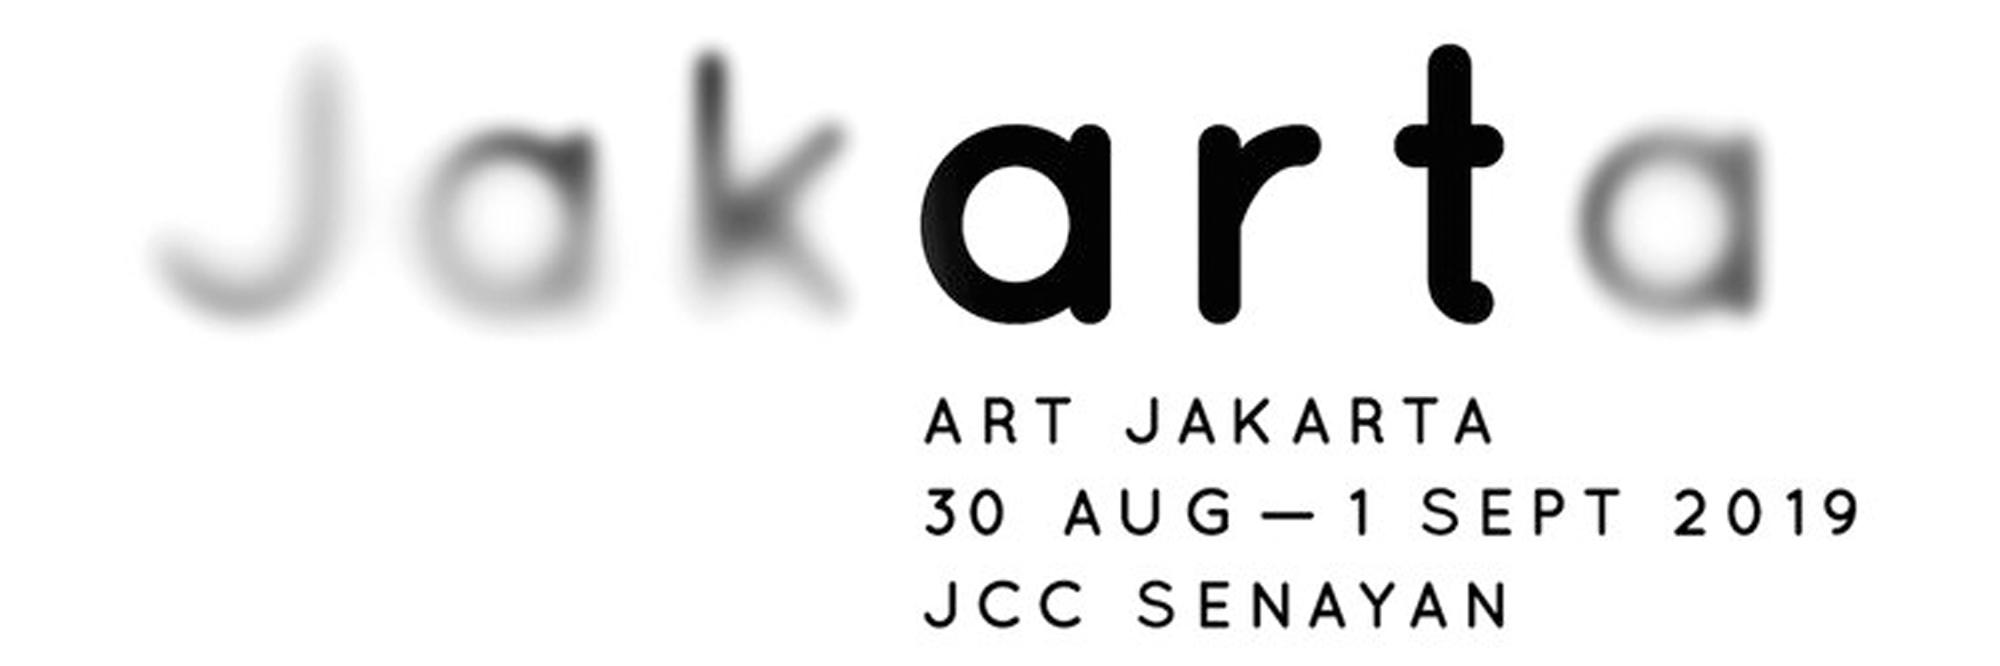 Art Jakarta Fair     Mella Jaarsma, Aliansyah Caniago   August 29 - September 1, 2019